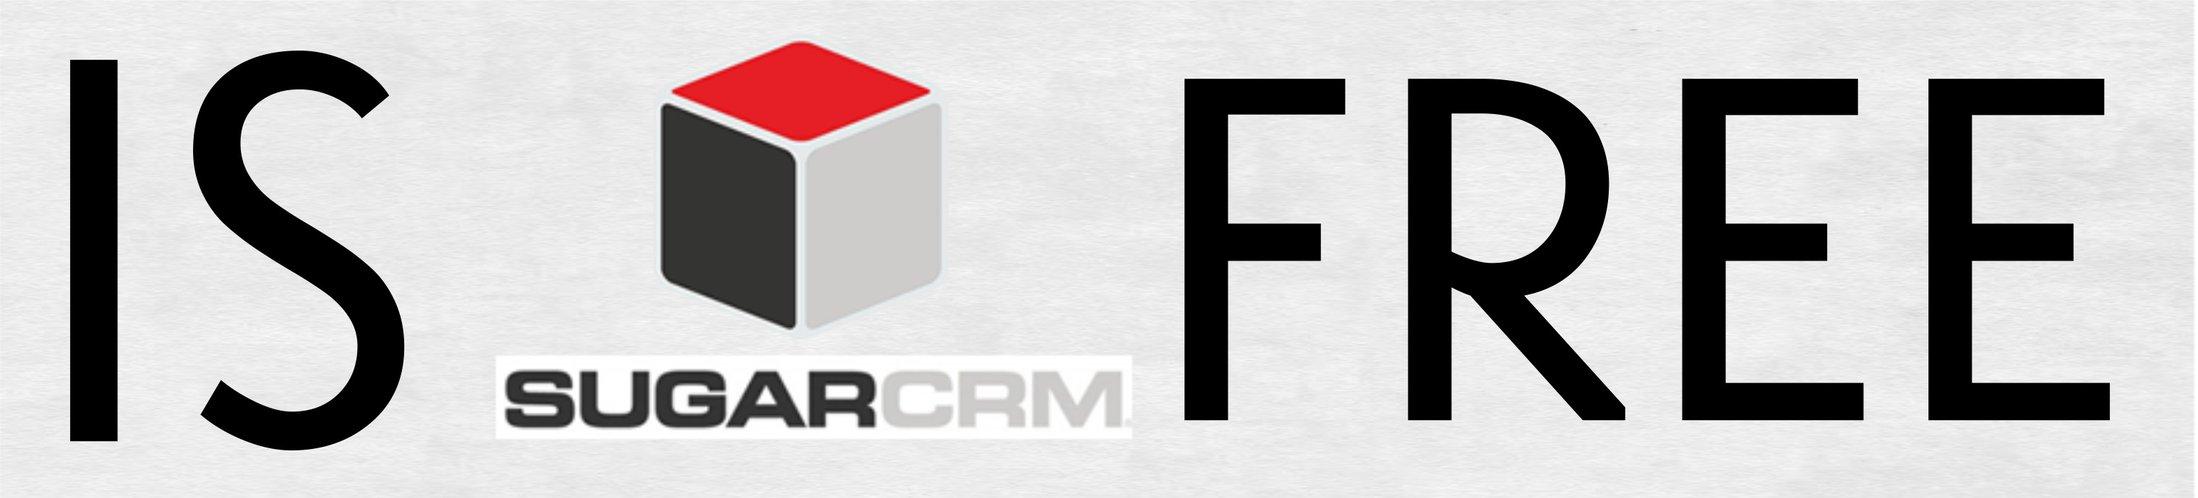 free crm